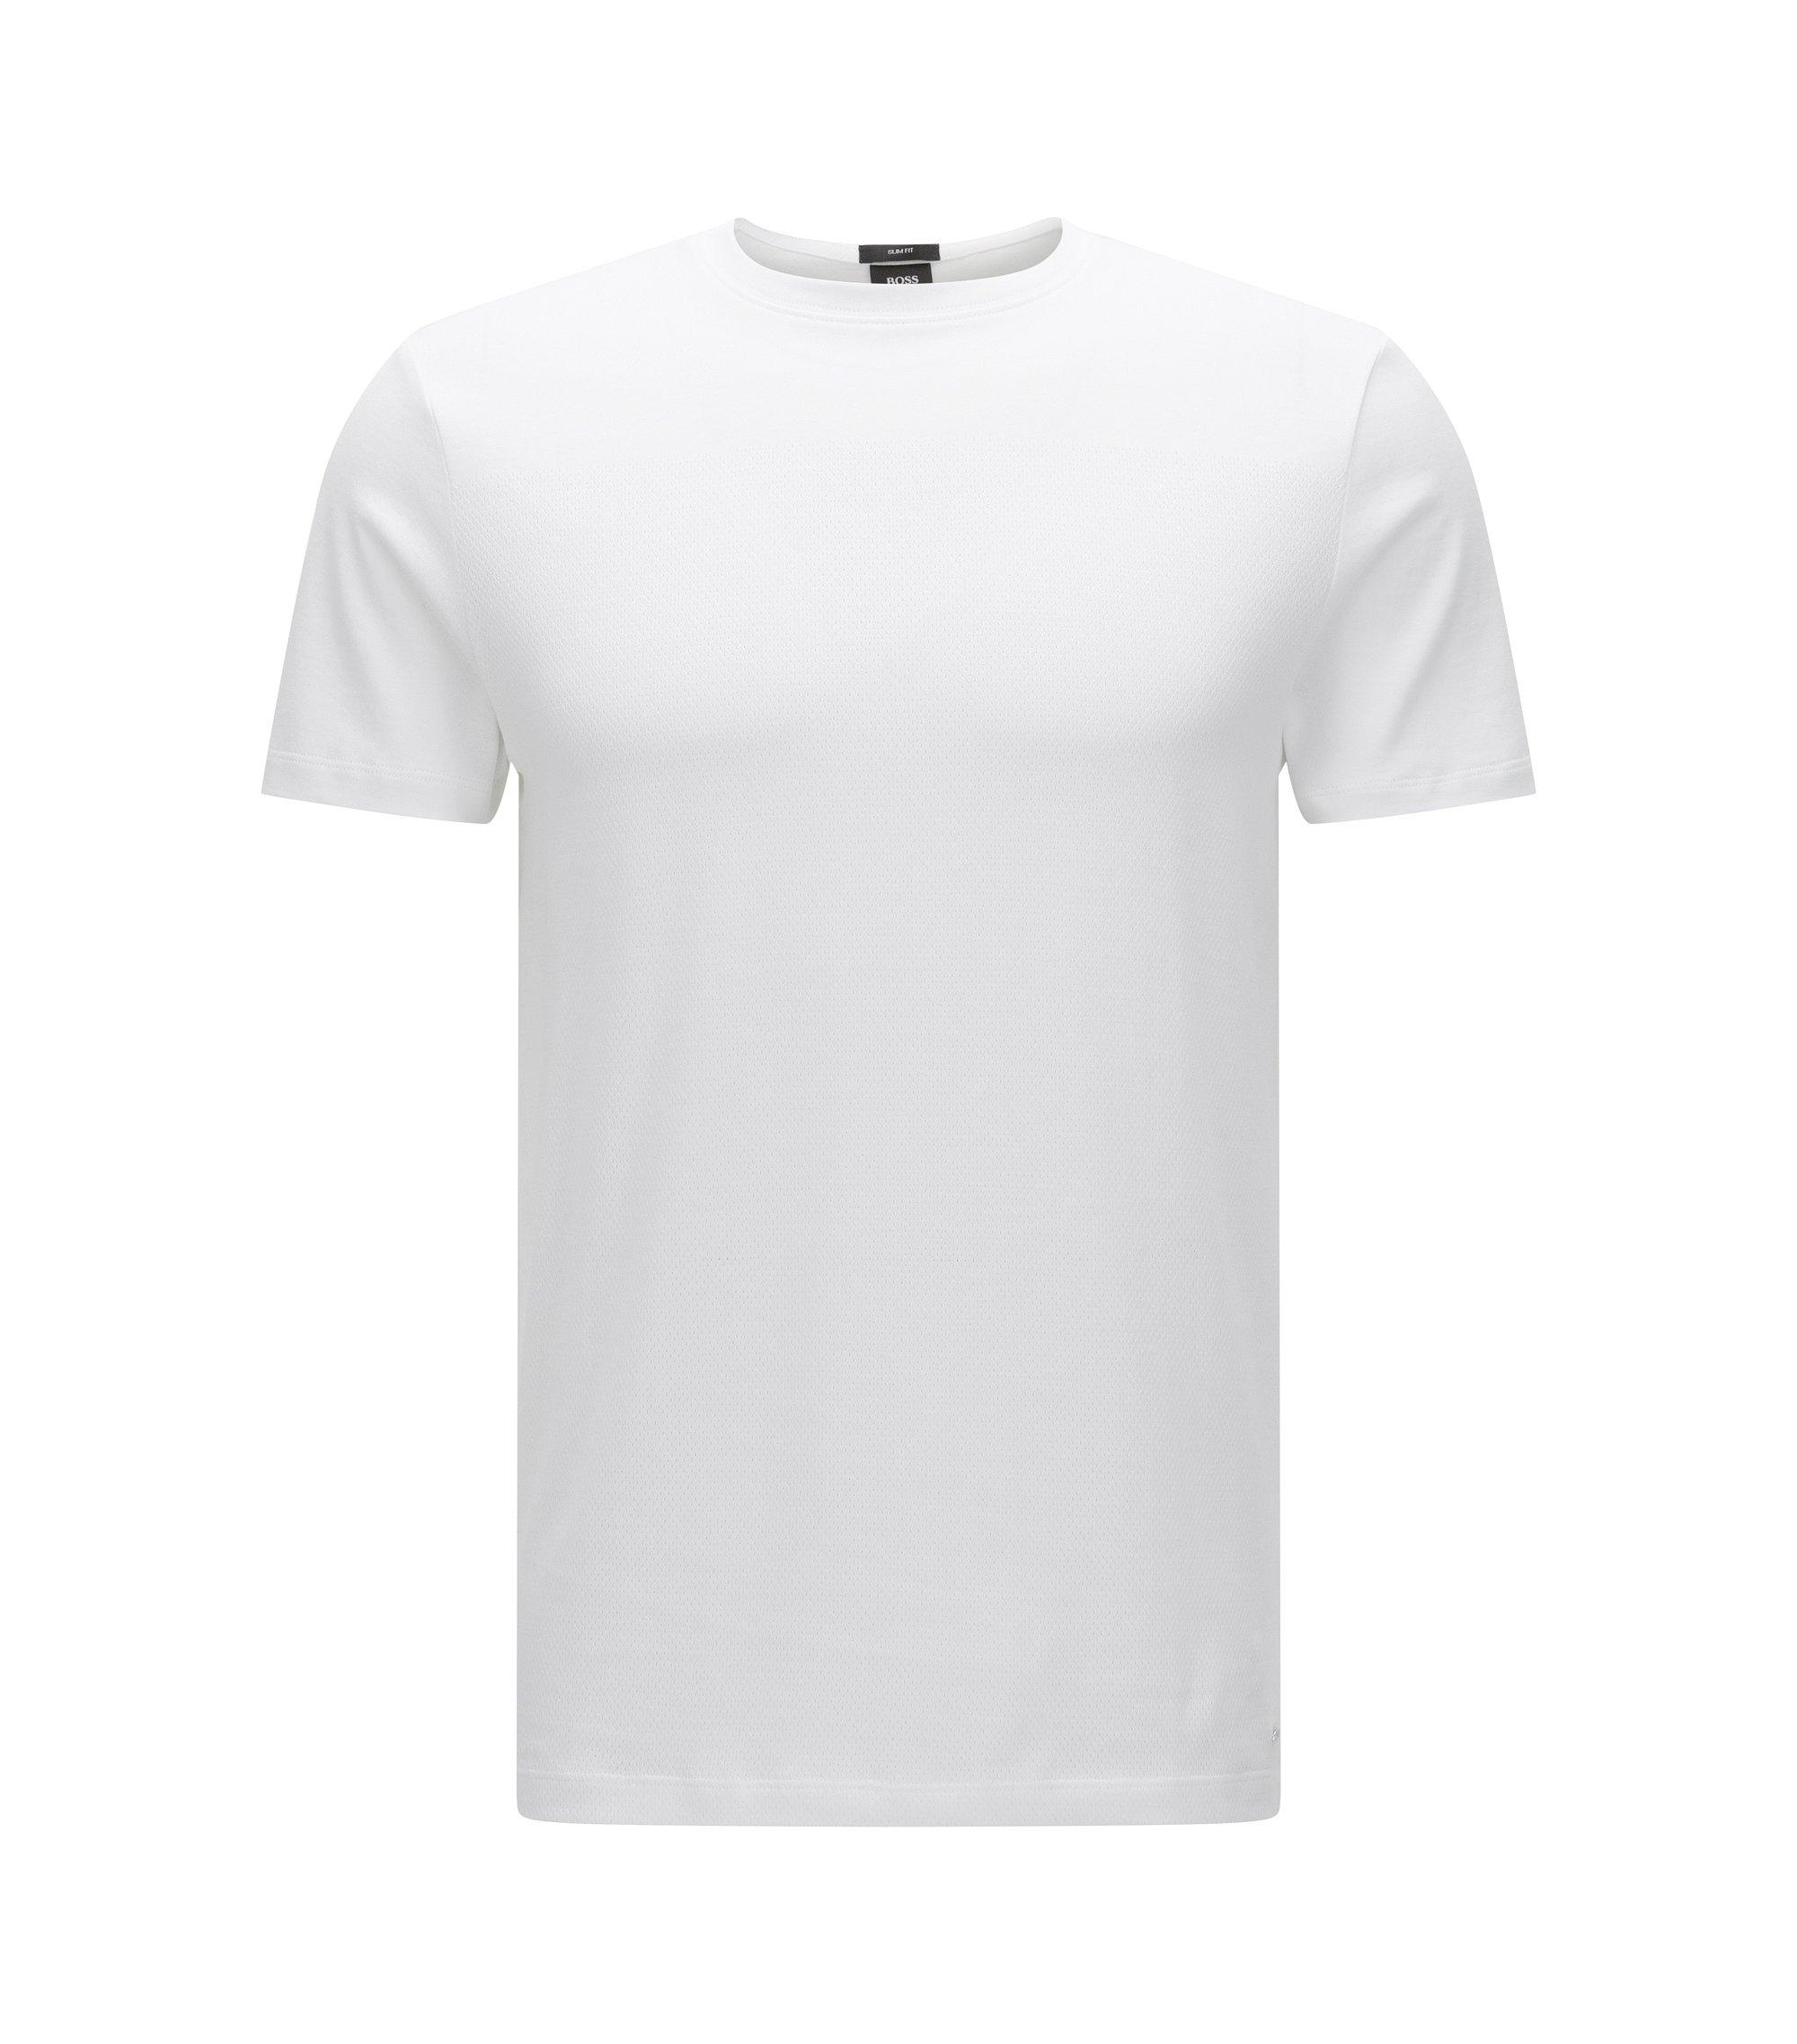 Cotton Mesh Texture T-Shirt | Tessler, White